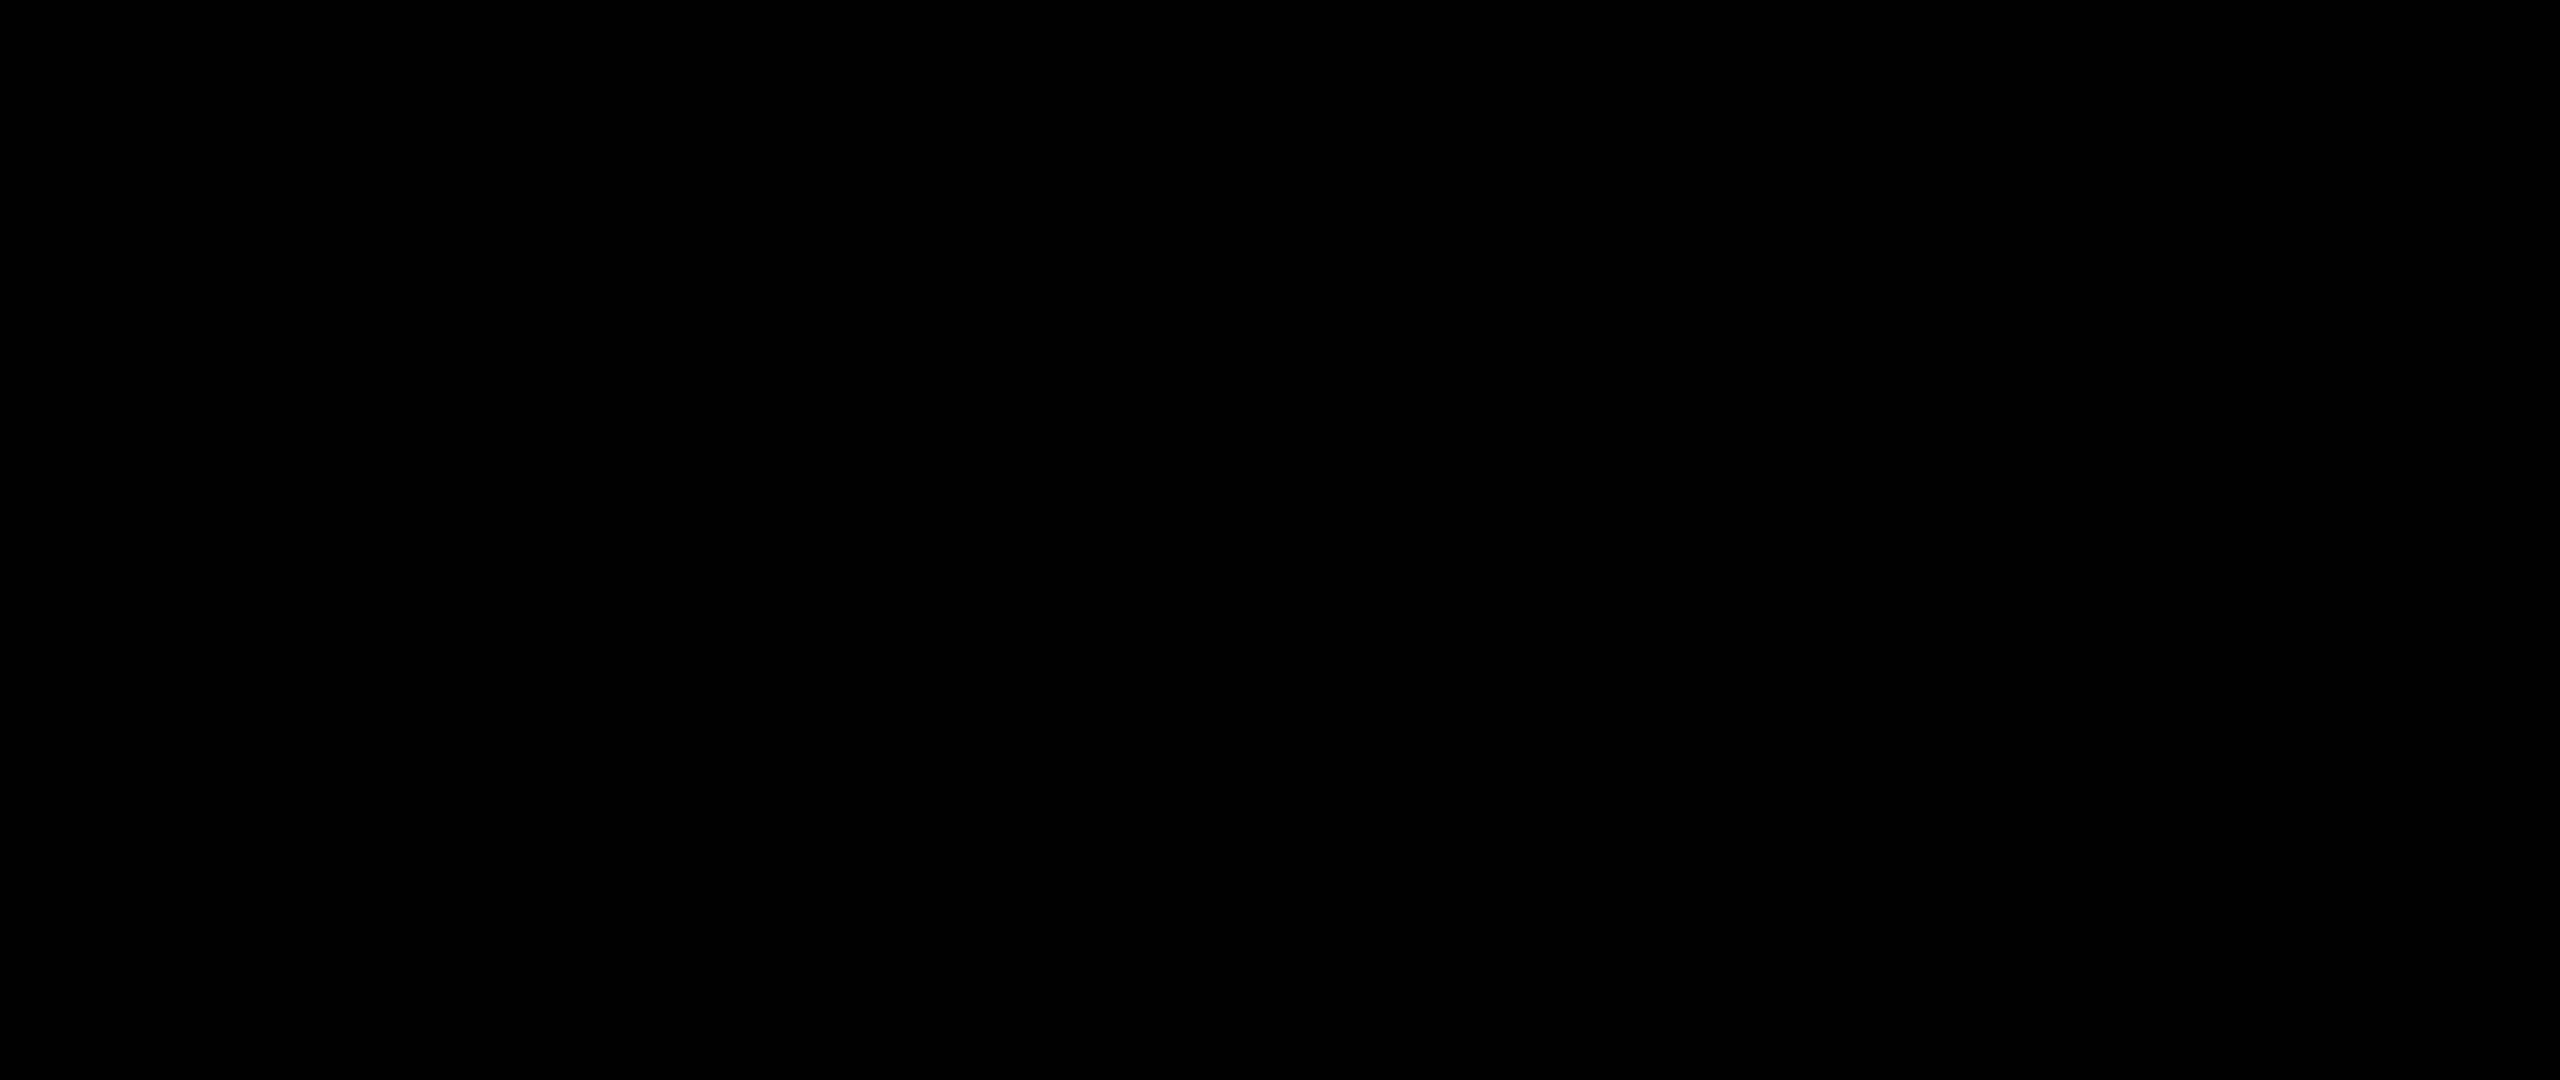 Estrella Galicia '1 Millón de Gracias'